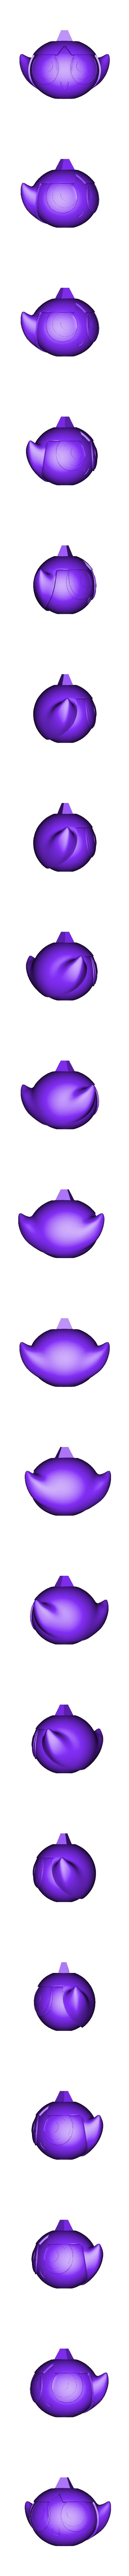 Green Nana - Head.stl Télécharger fichier STL Super Nana Totem • Design imprimable en 3D, BODY3D